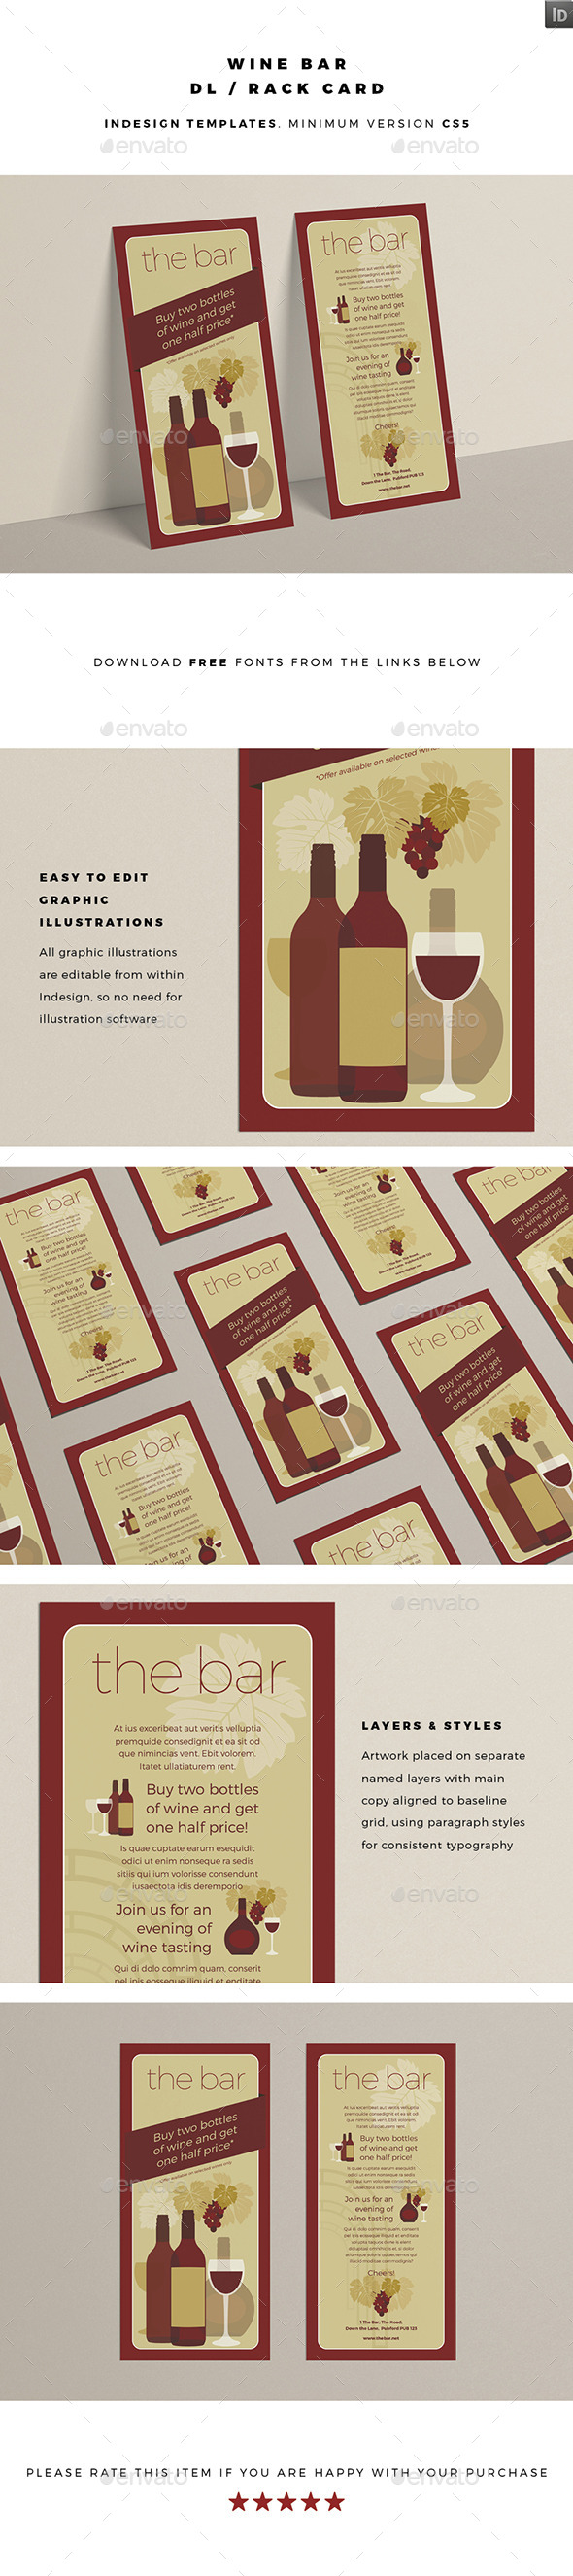 DL / Rack Card - Wine Bar - Restaurant Flyers